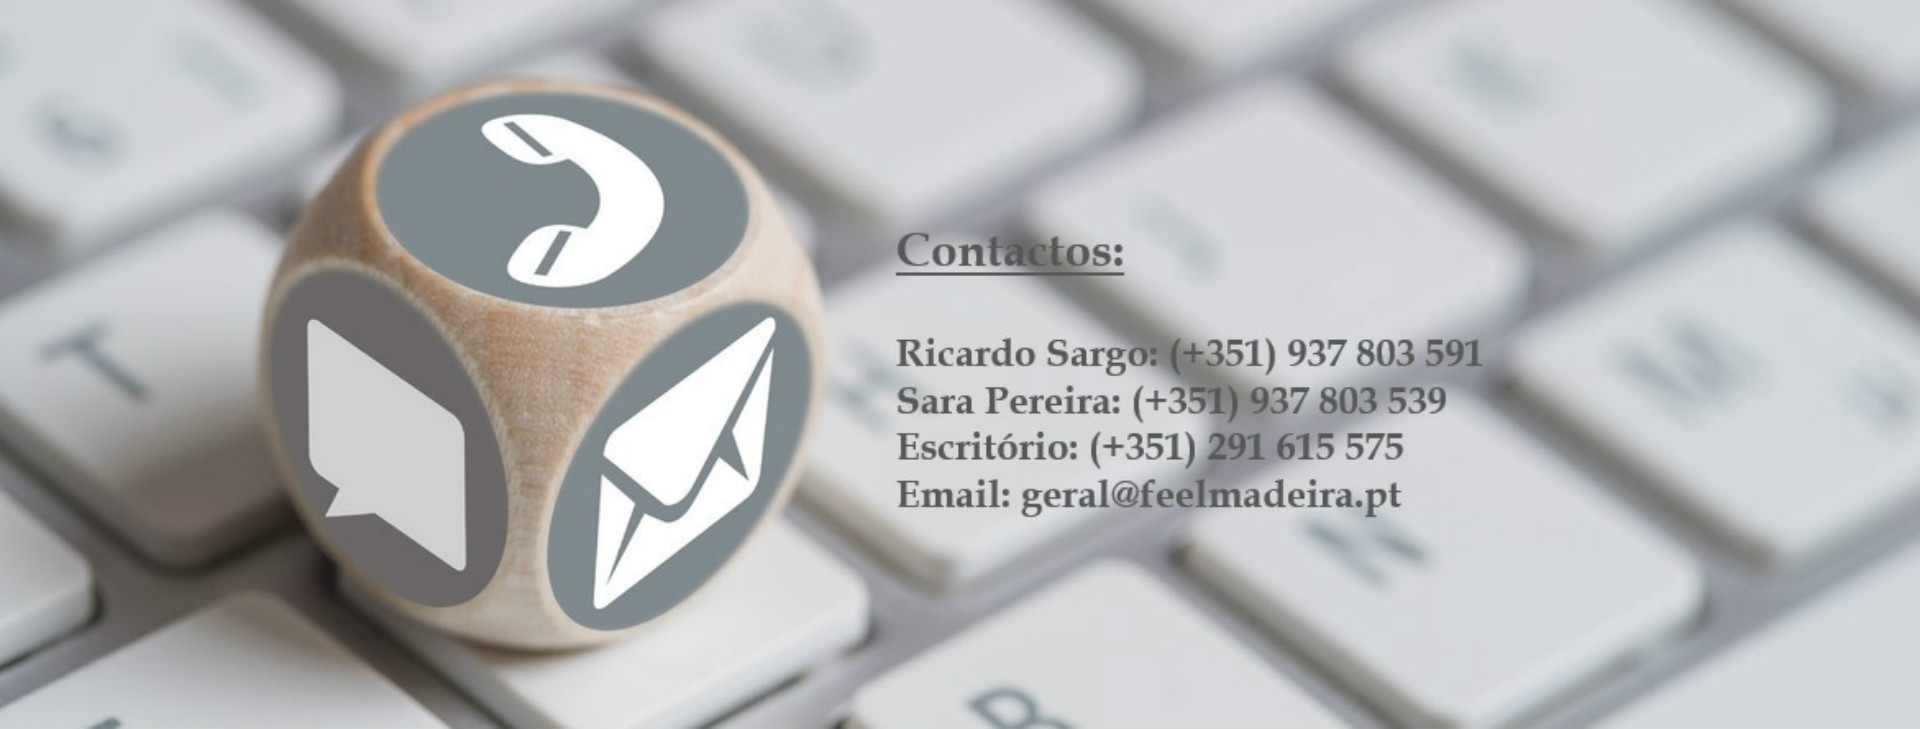 Loja: 291615575 / Ricardo Sargo: 937 803 591 / Sara Pereira: 937 803 539 / Email: feelmadeiraimobiliaria@gmail.com